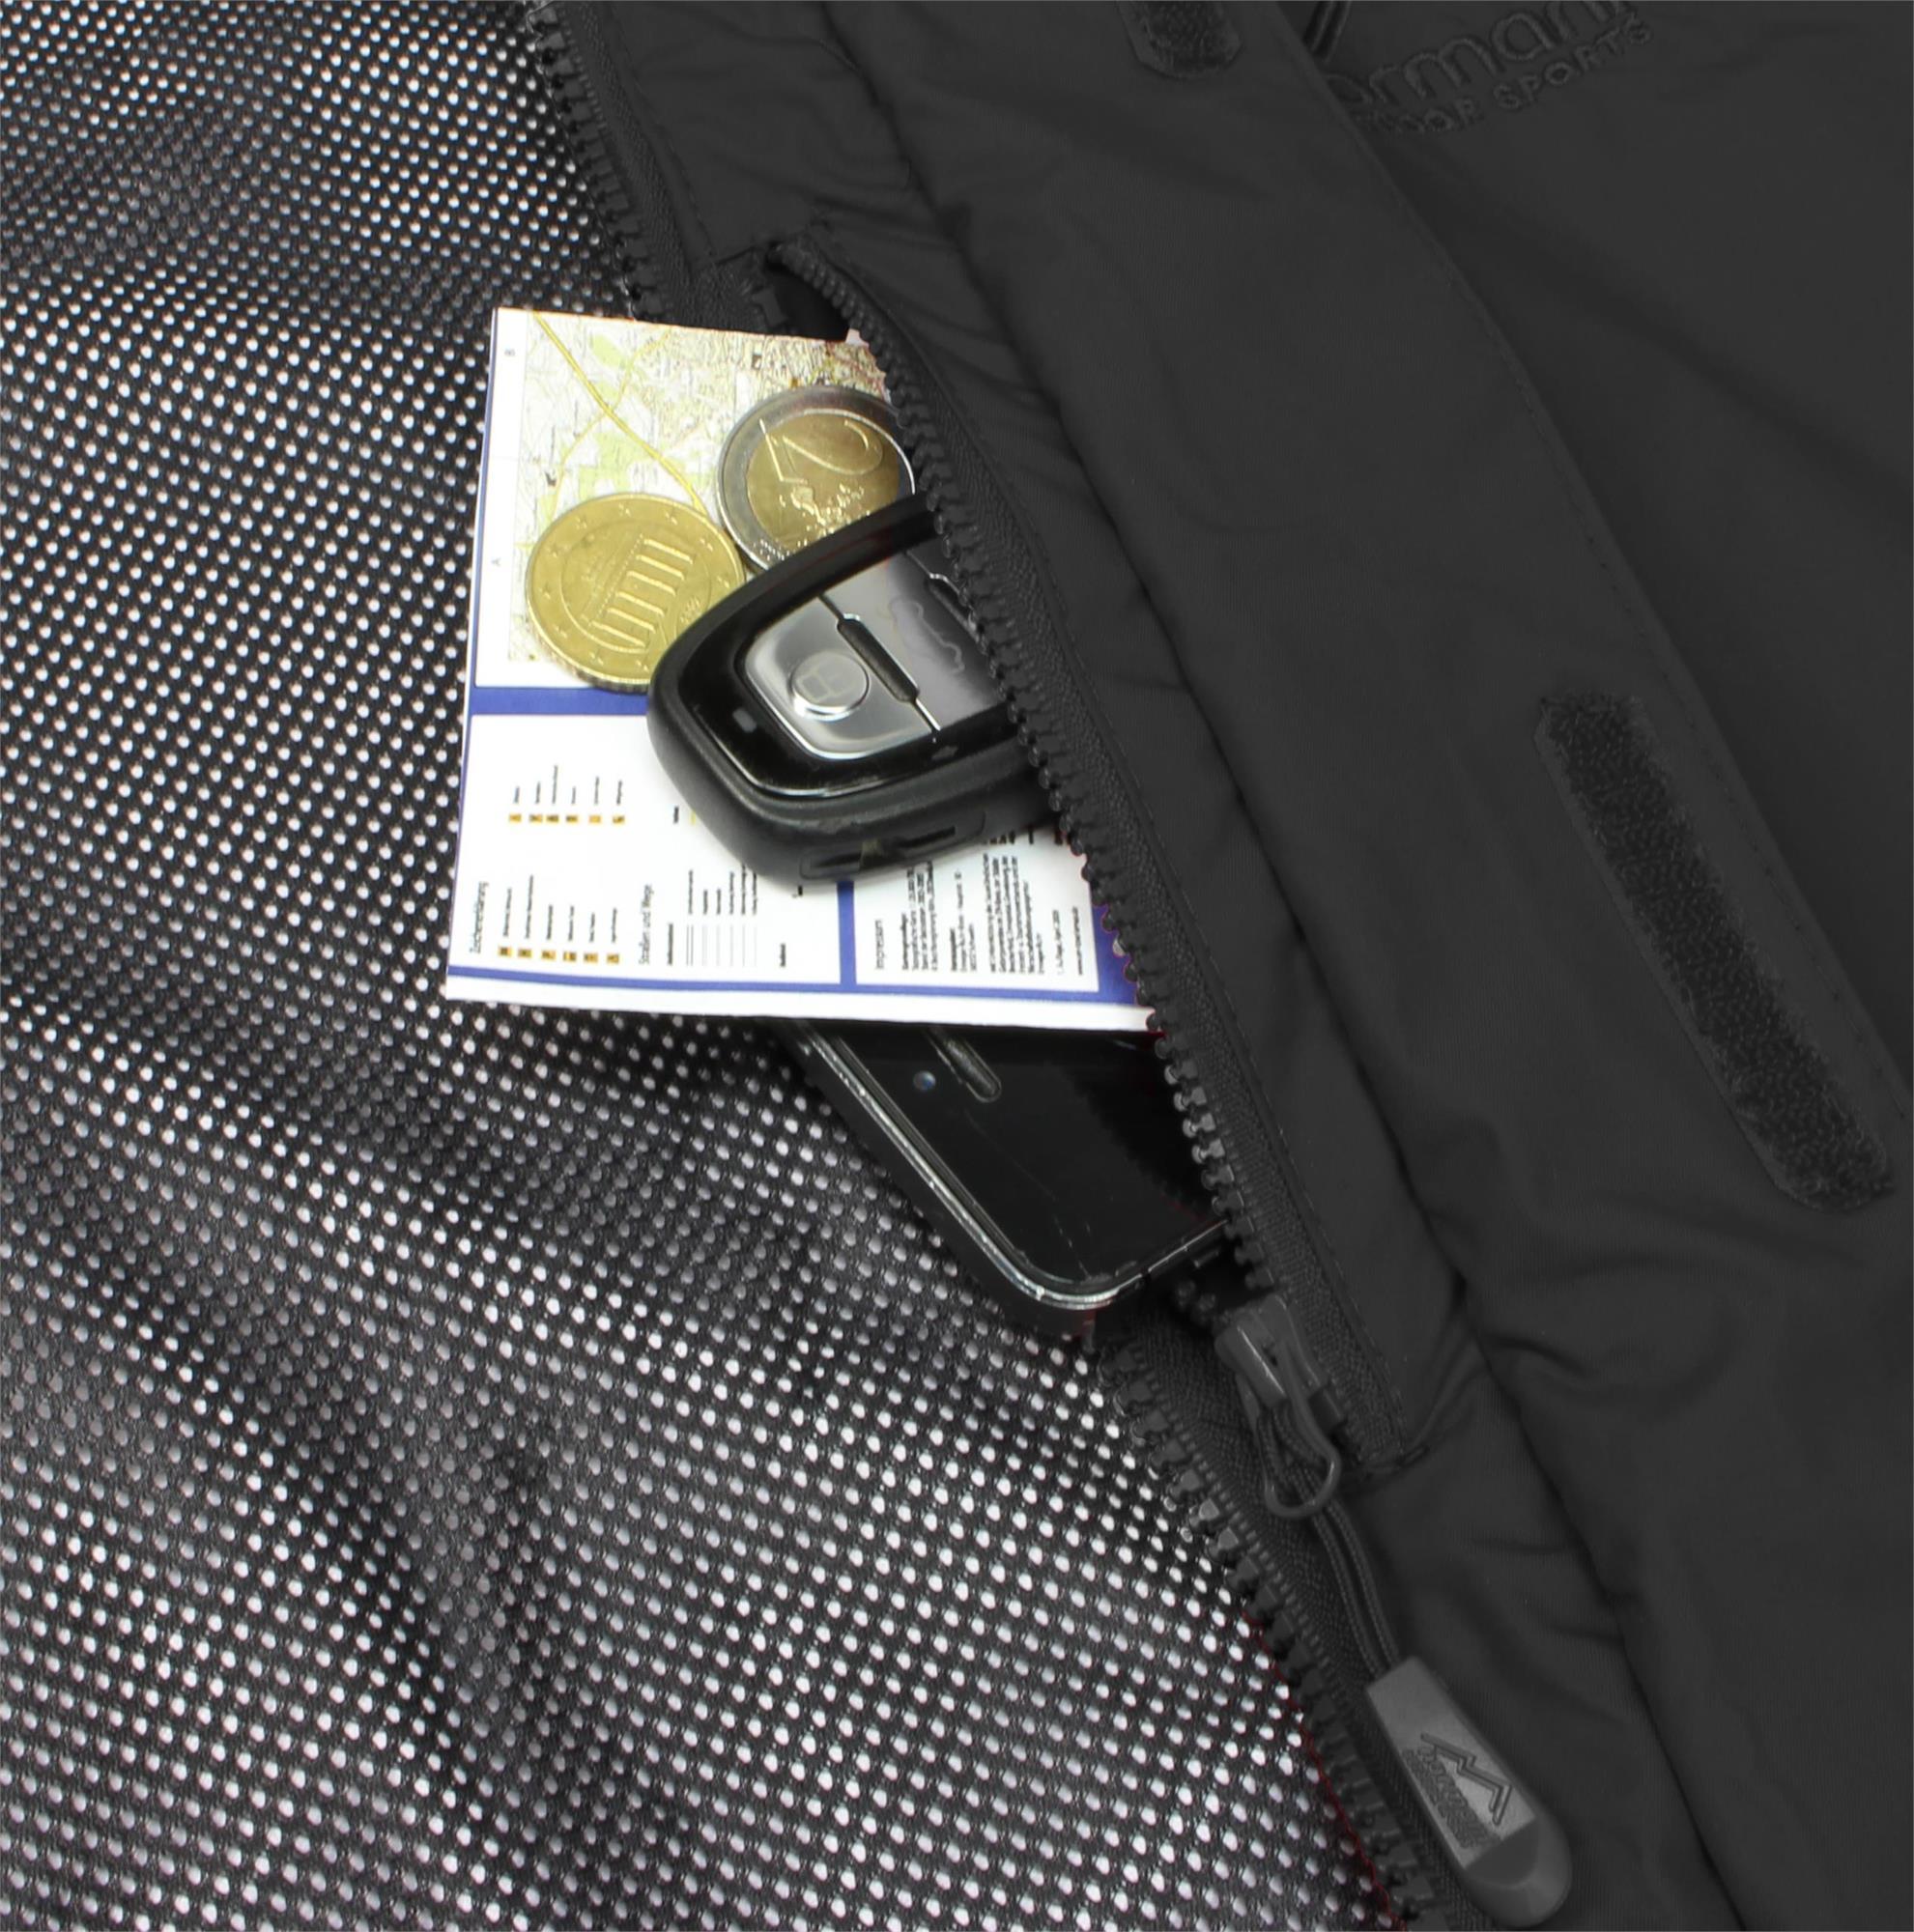 Indexbild 10 - Damen-Jacke Hardshelljacke Übergangs-Regenjacke mit Kapuze Wassersäule 10.000mm